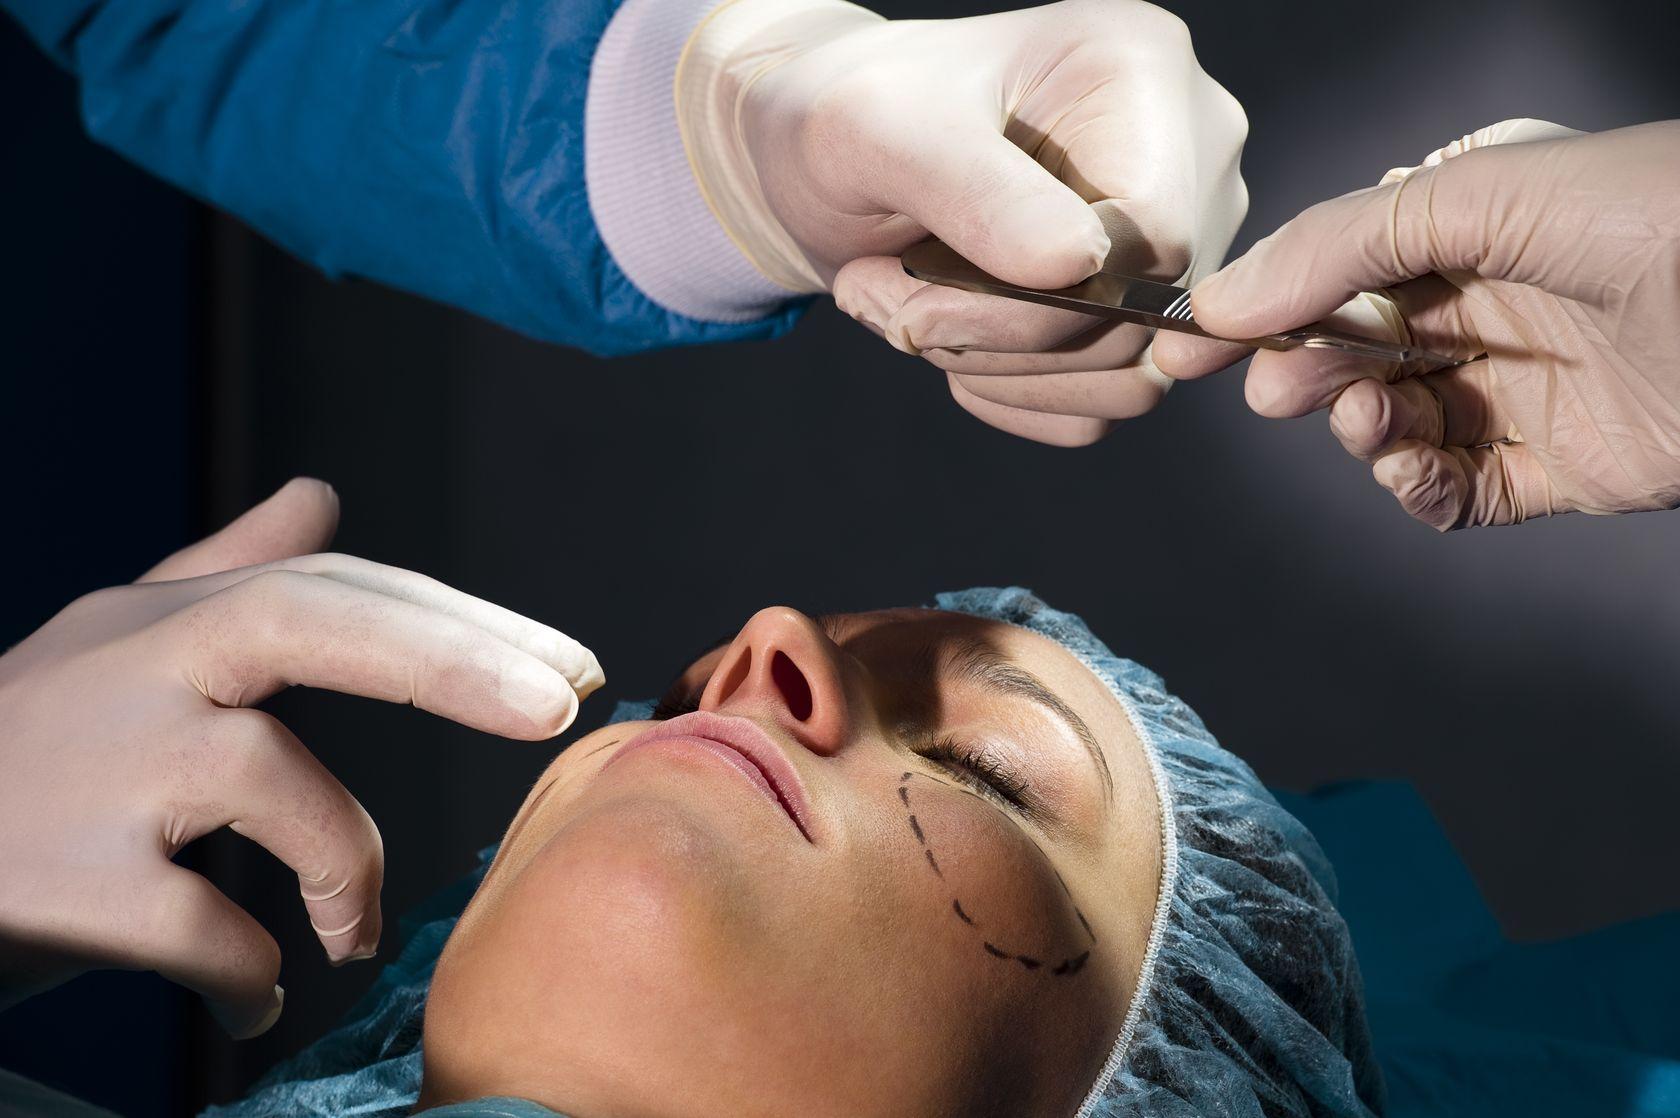 test karcsú műtét)